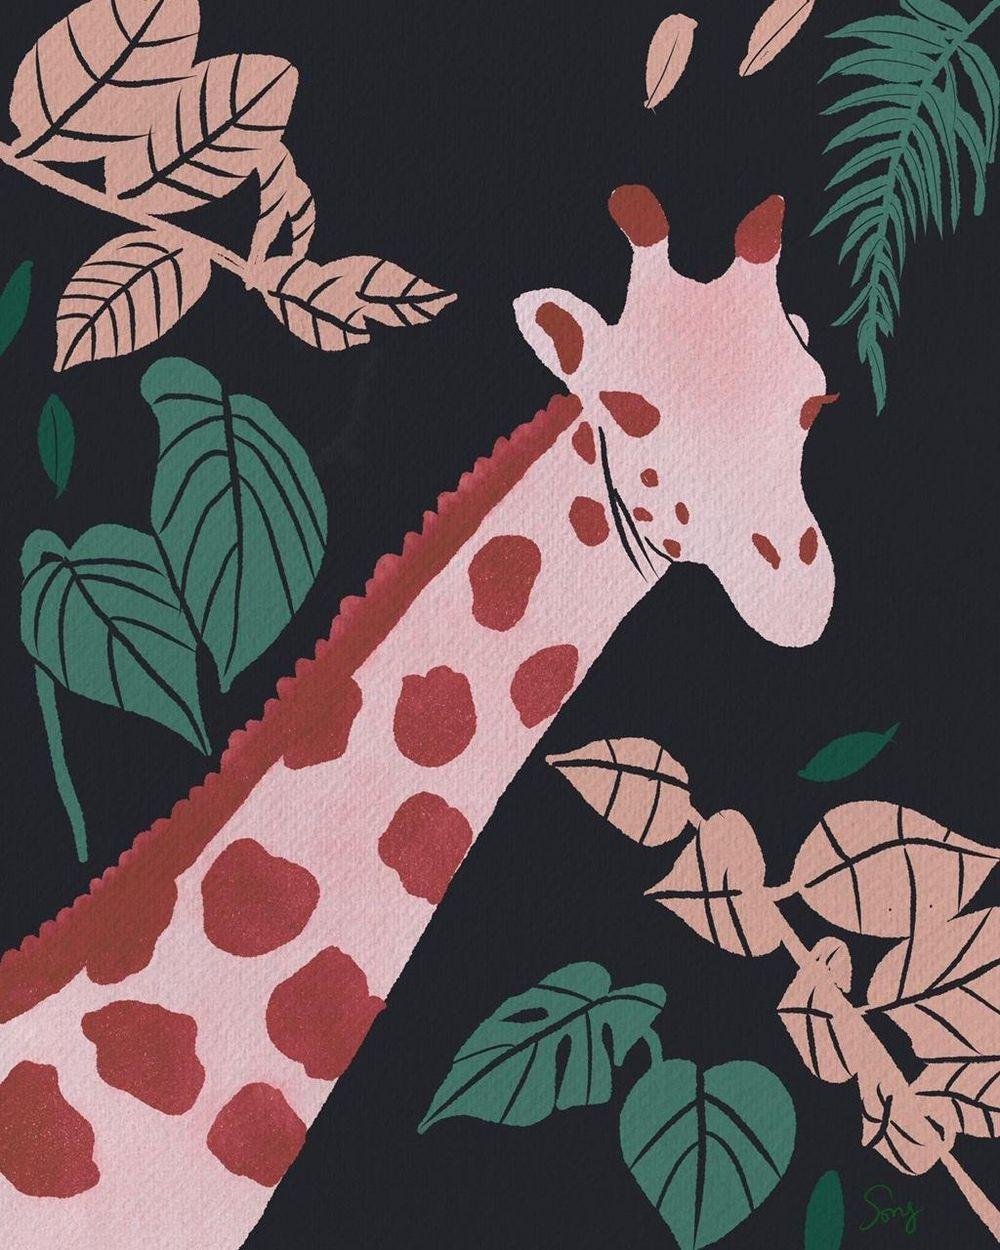 SummerGiraffe - image 2 - student project